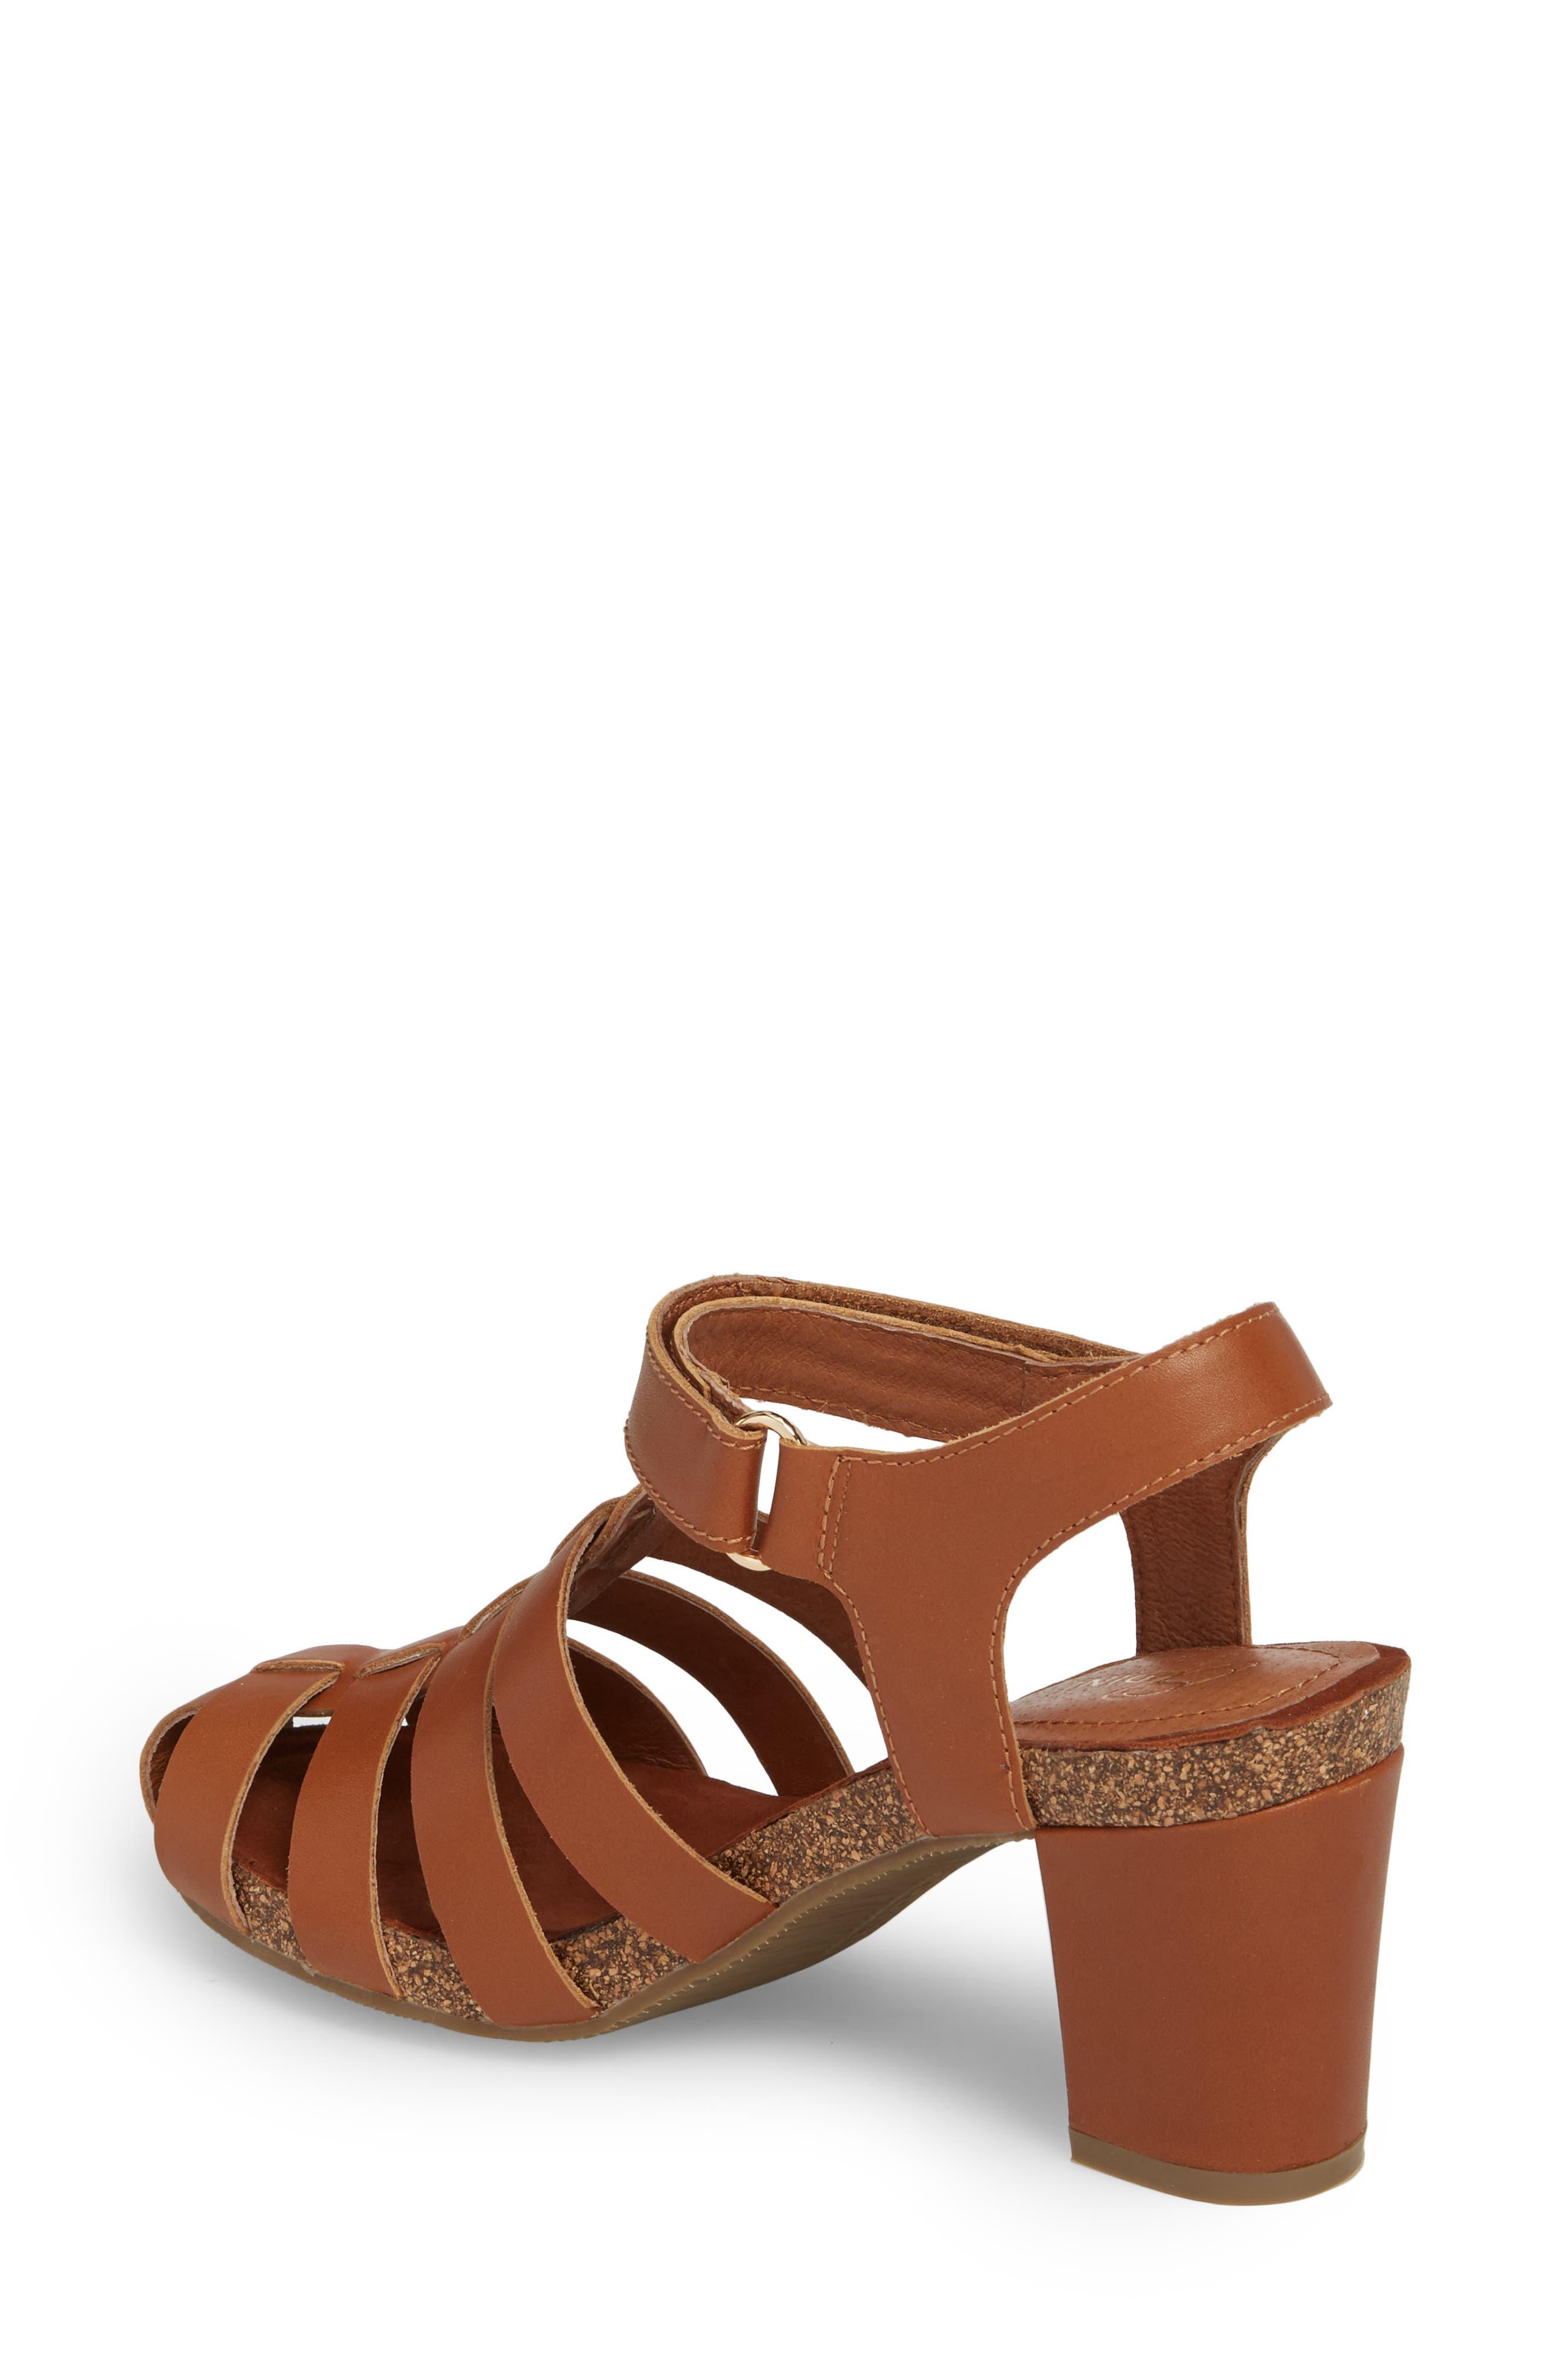 Carrara Block Heel Sandal,                             Alternate thumbnail 2, color,                             Cognac Leather